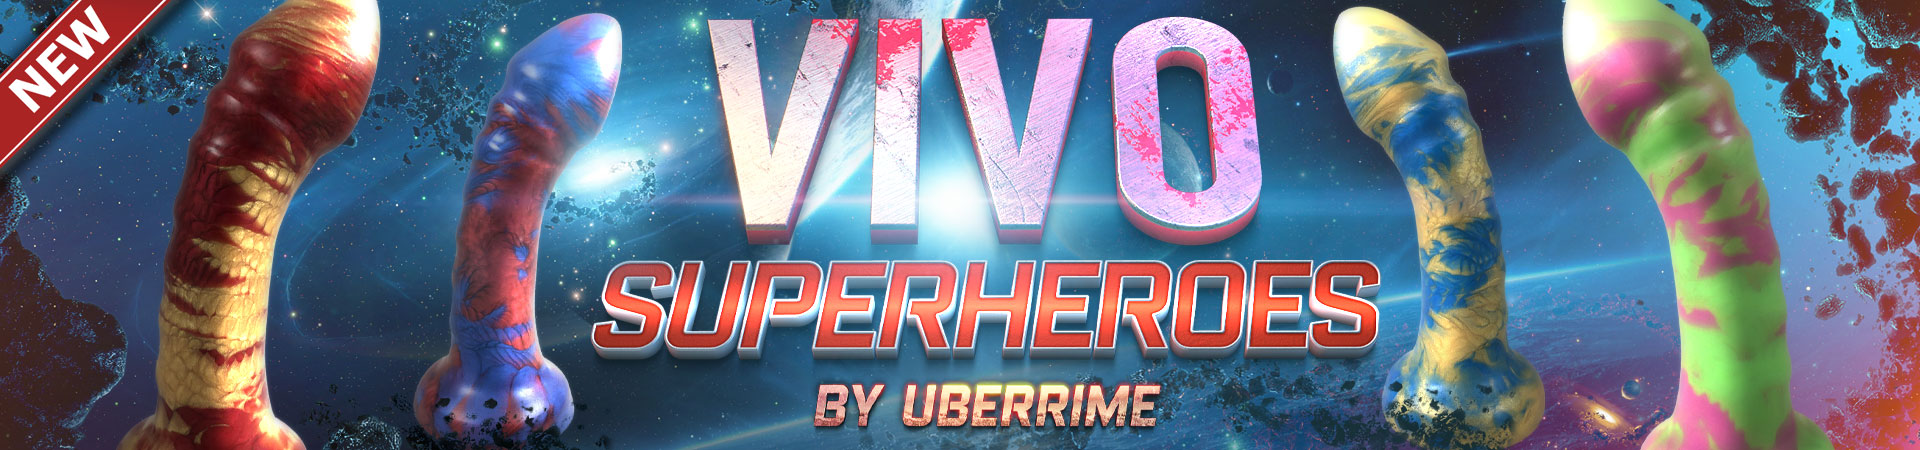 New! Vivo Superheroes By Uberrime